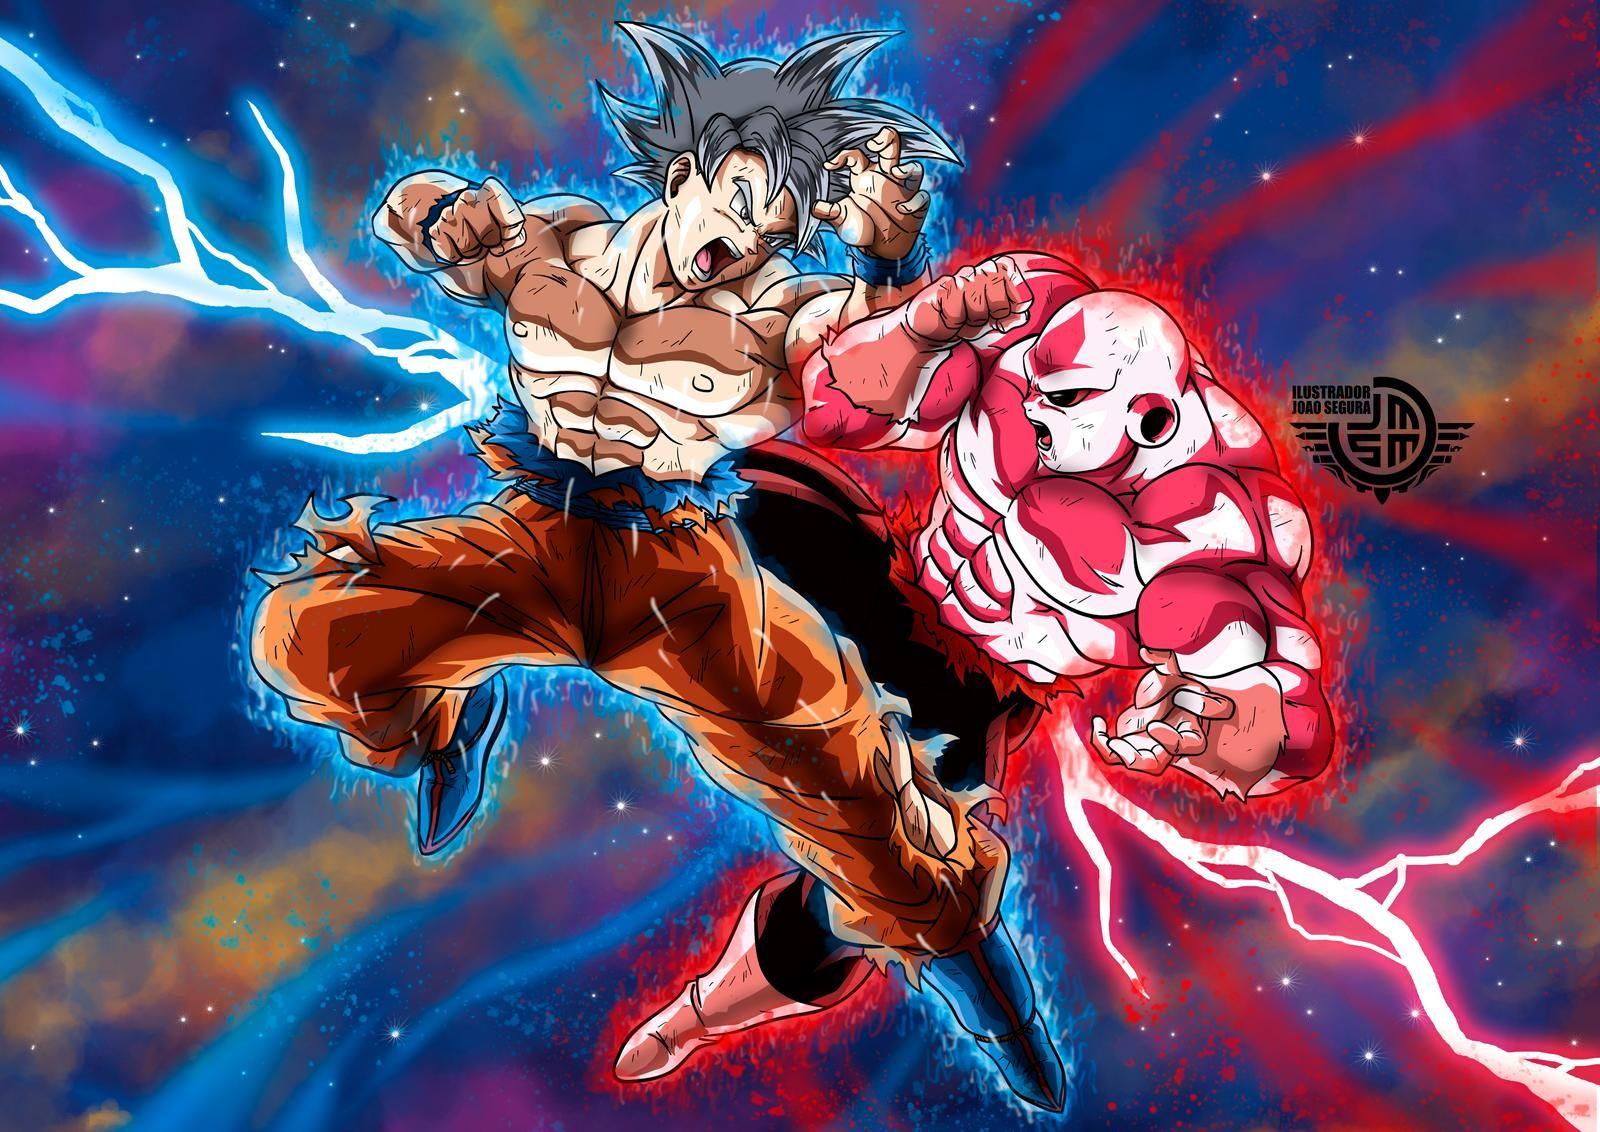 Goku Vs Jiren By Ilustradorjoaosegura On Deviantart Goku Vs Jiren Goku Goku Vs